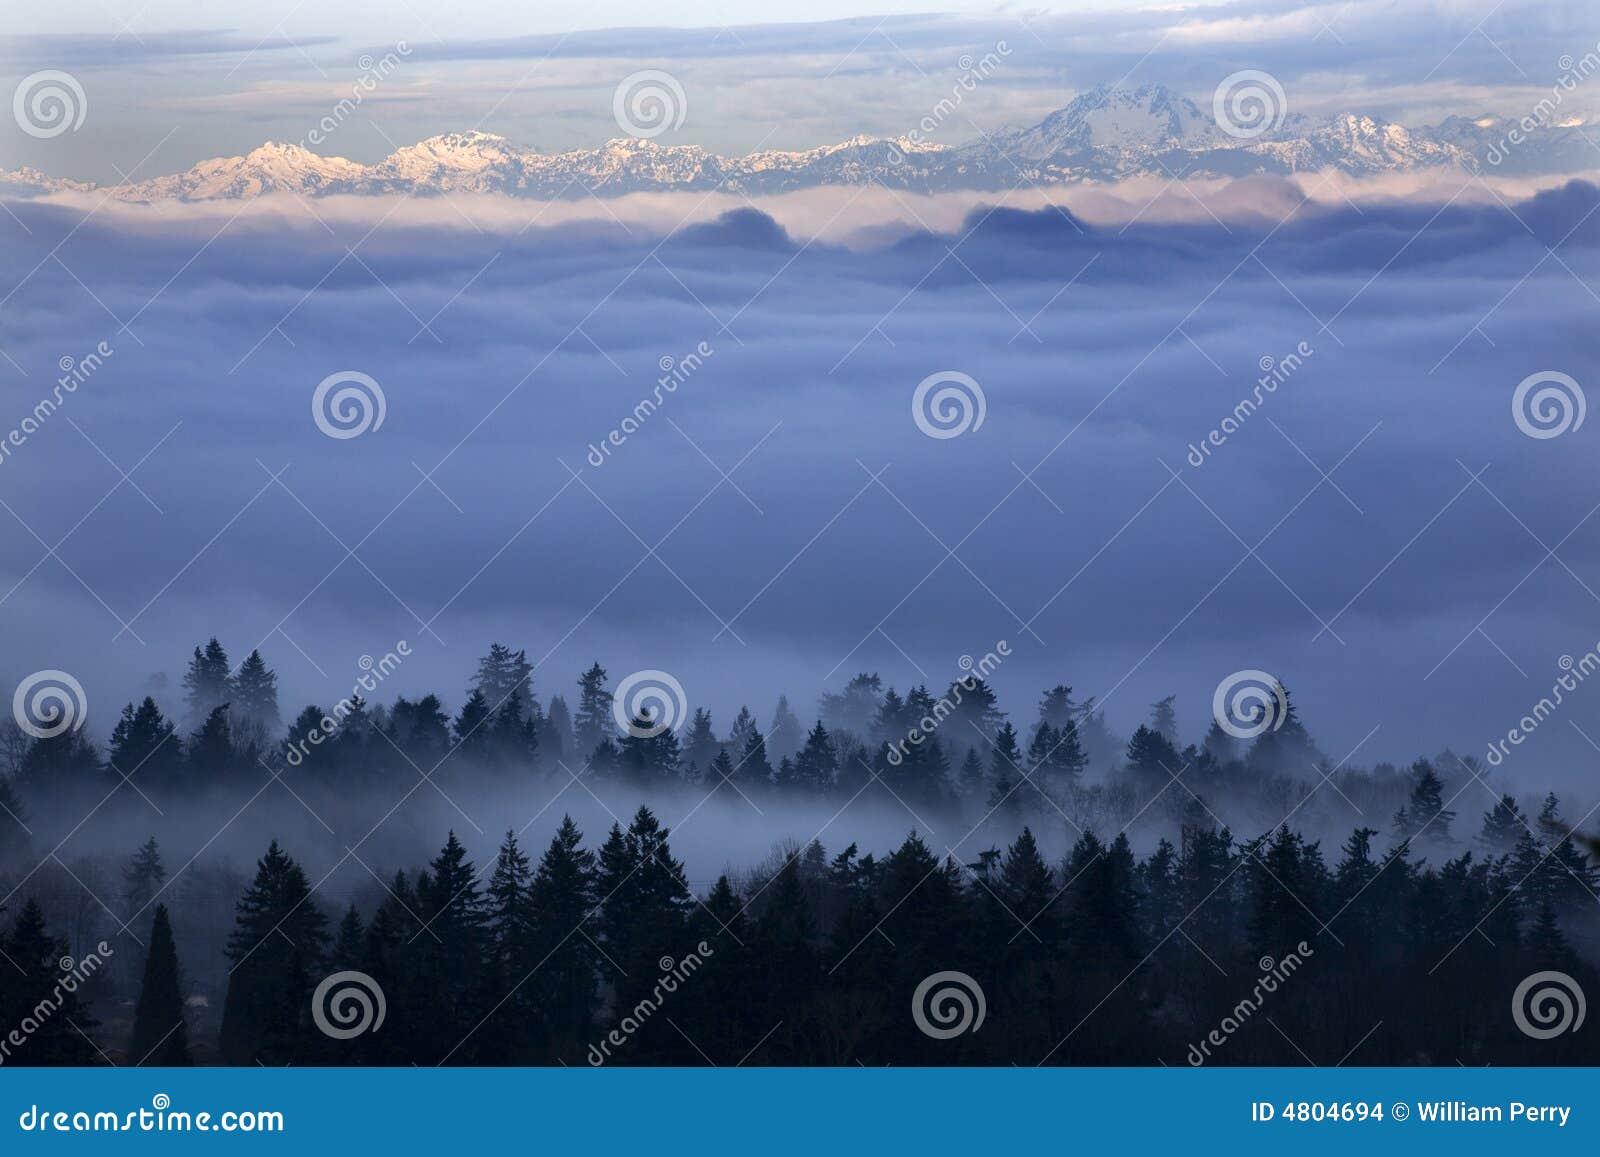 Seattle Under the Fog